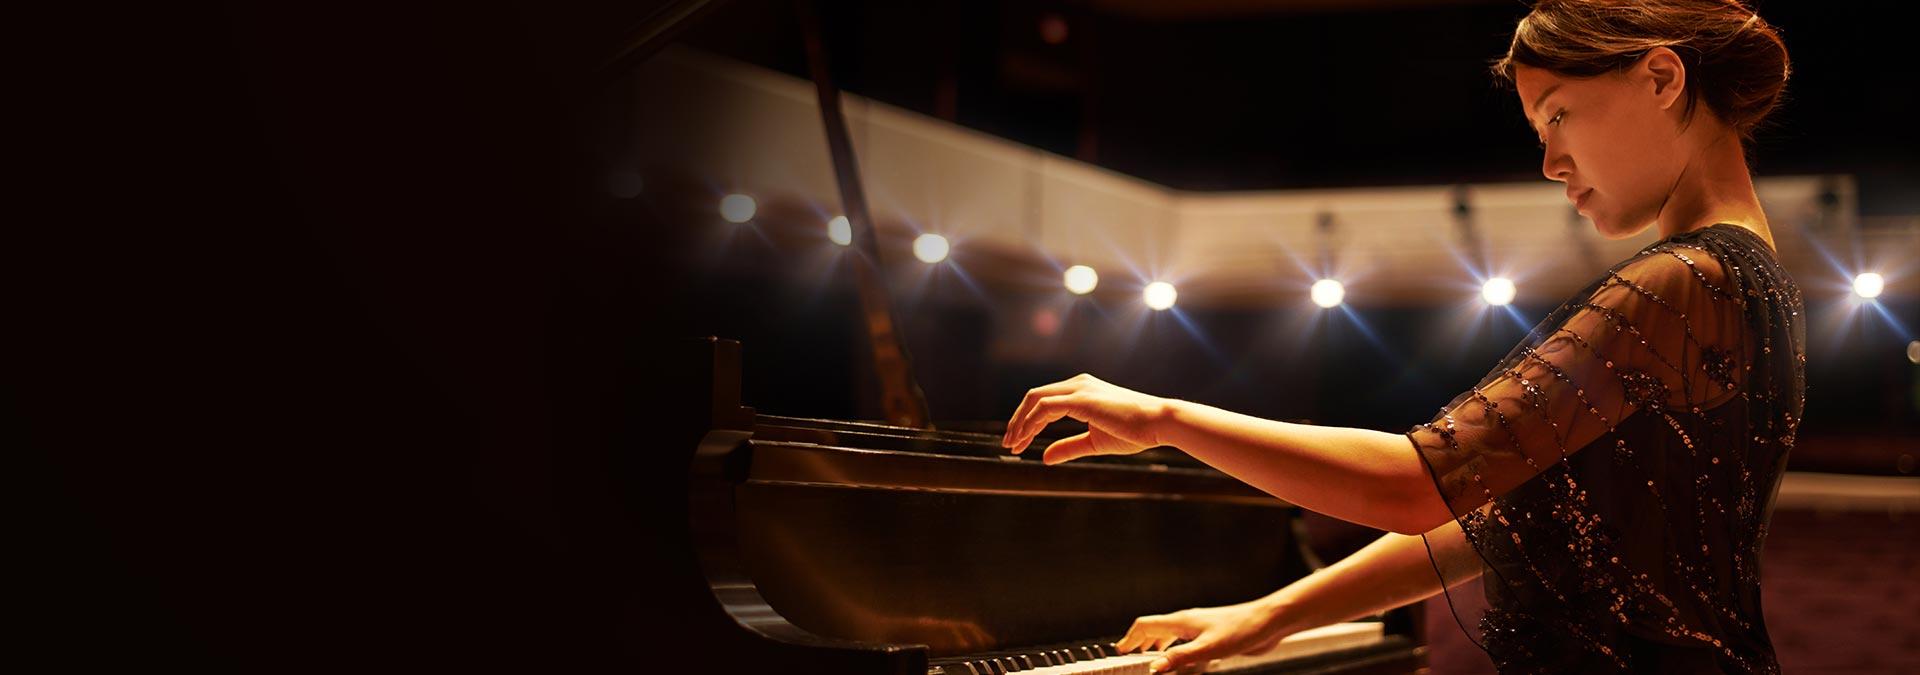 Piano Federation